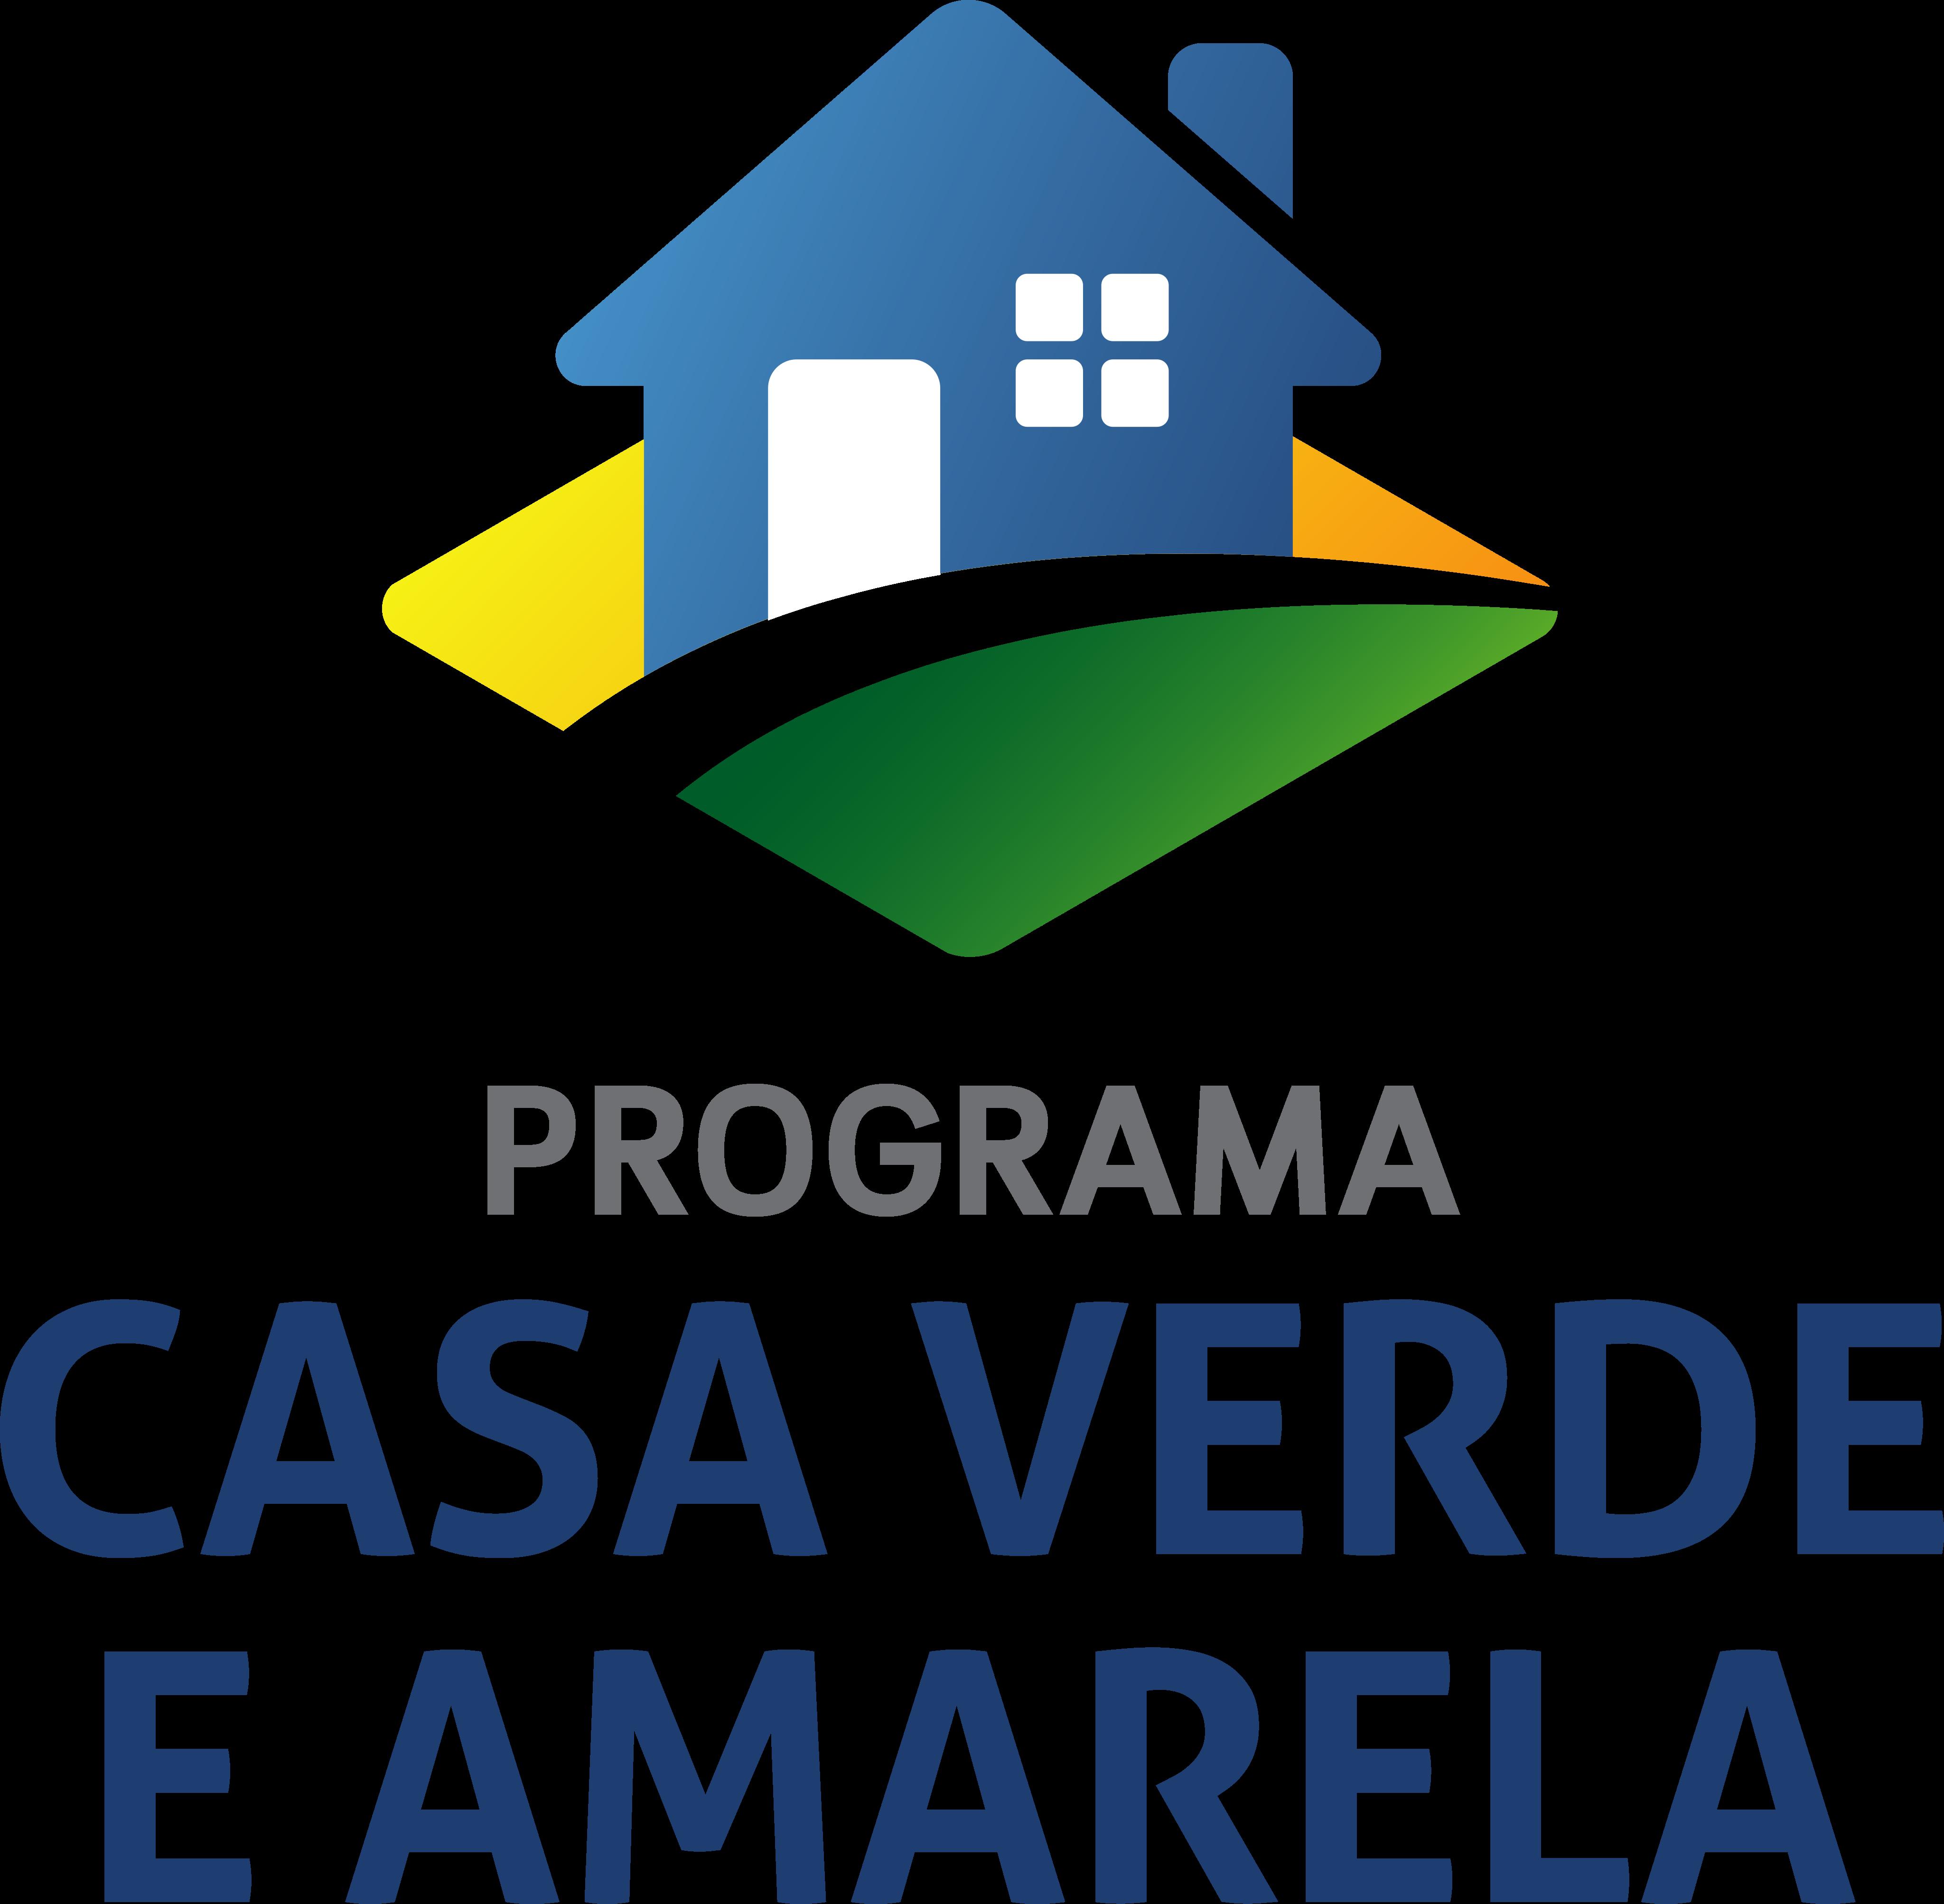 casa verde e amarela logo 1 - Programa Casa Verde e Amarela Logo